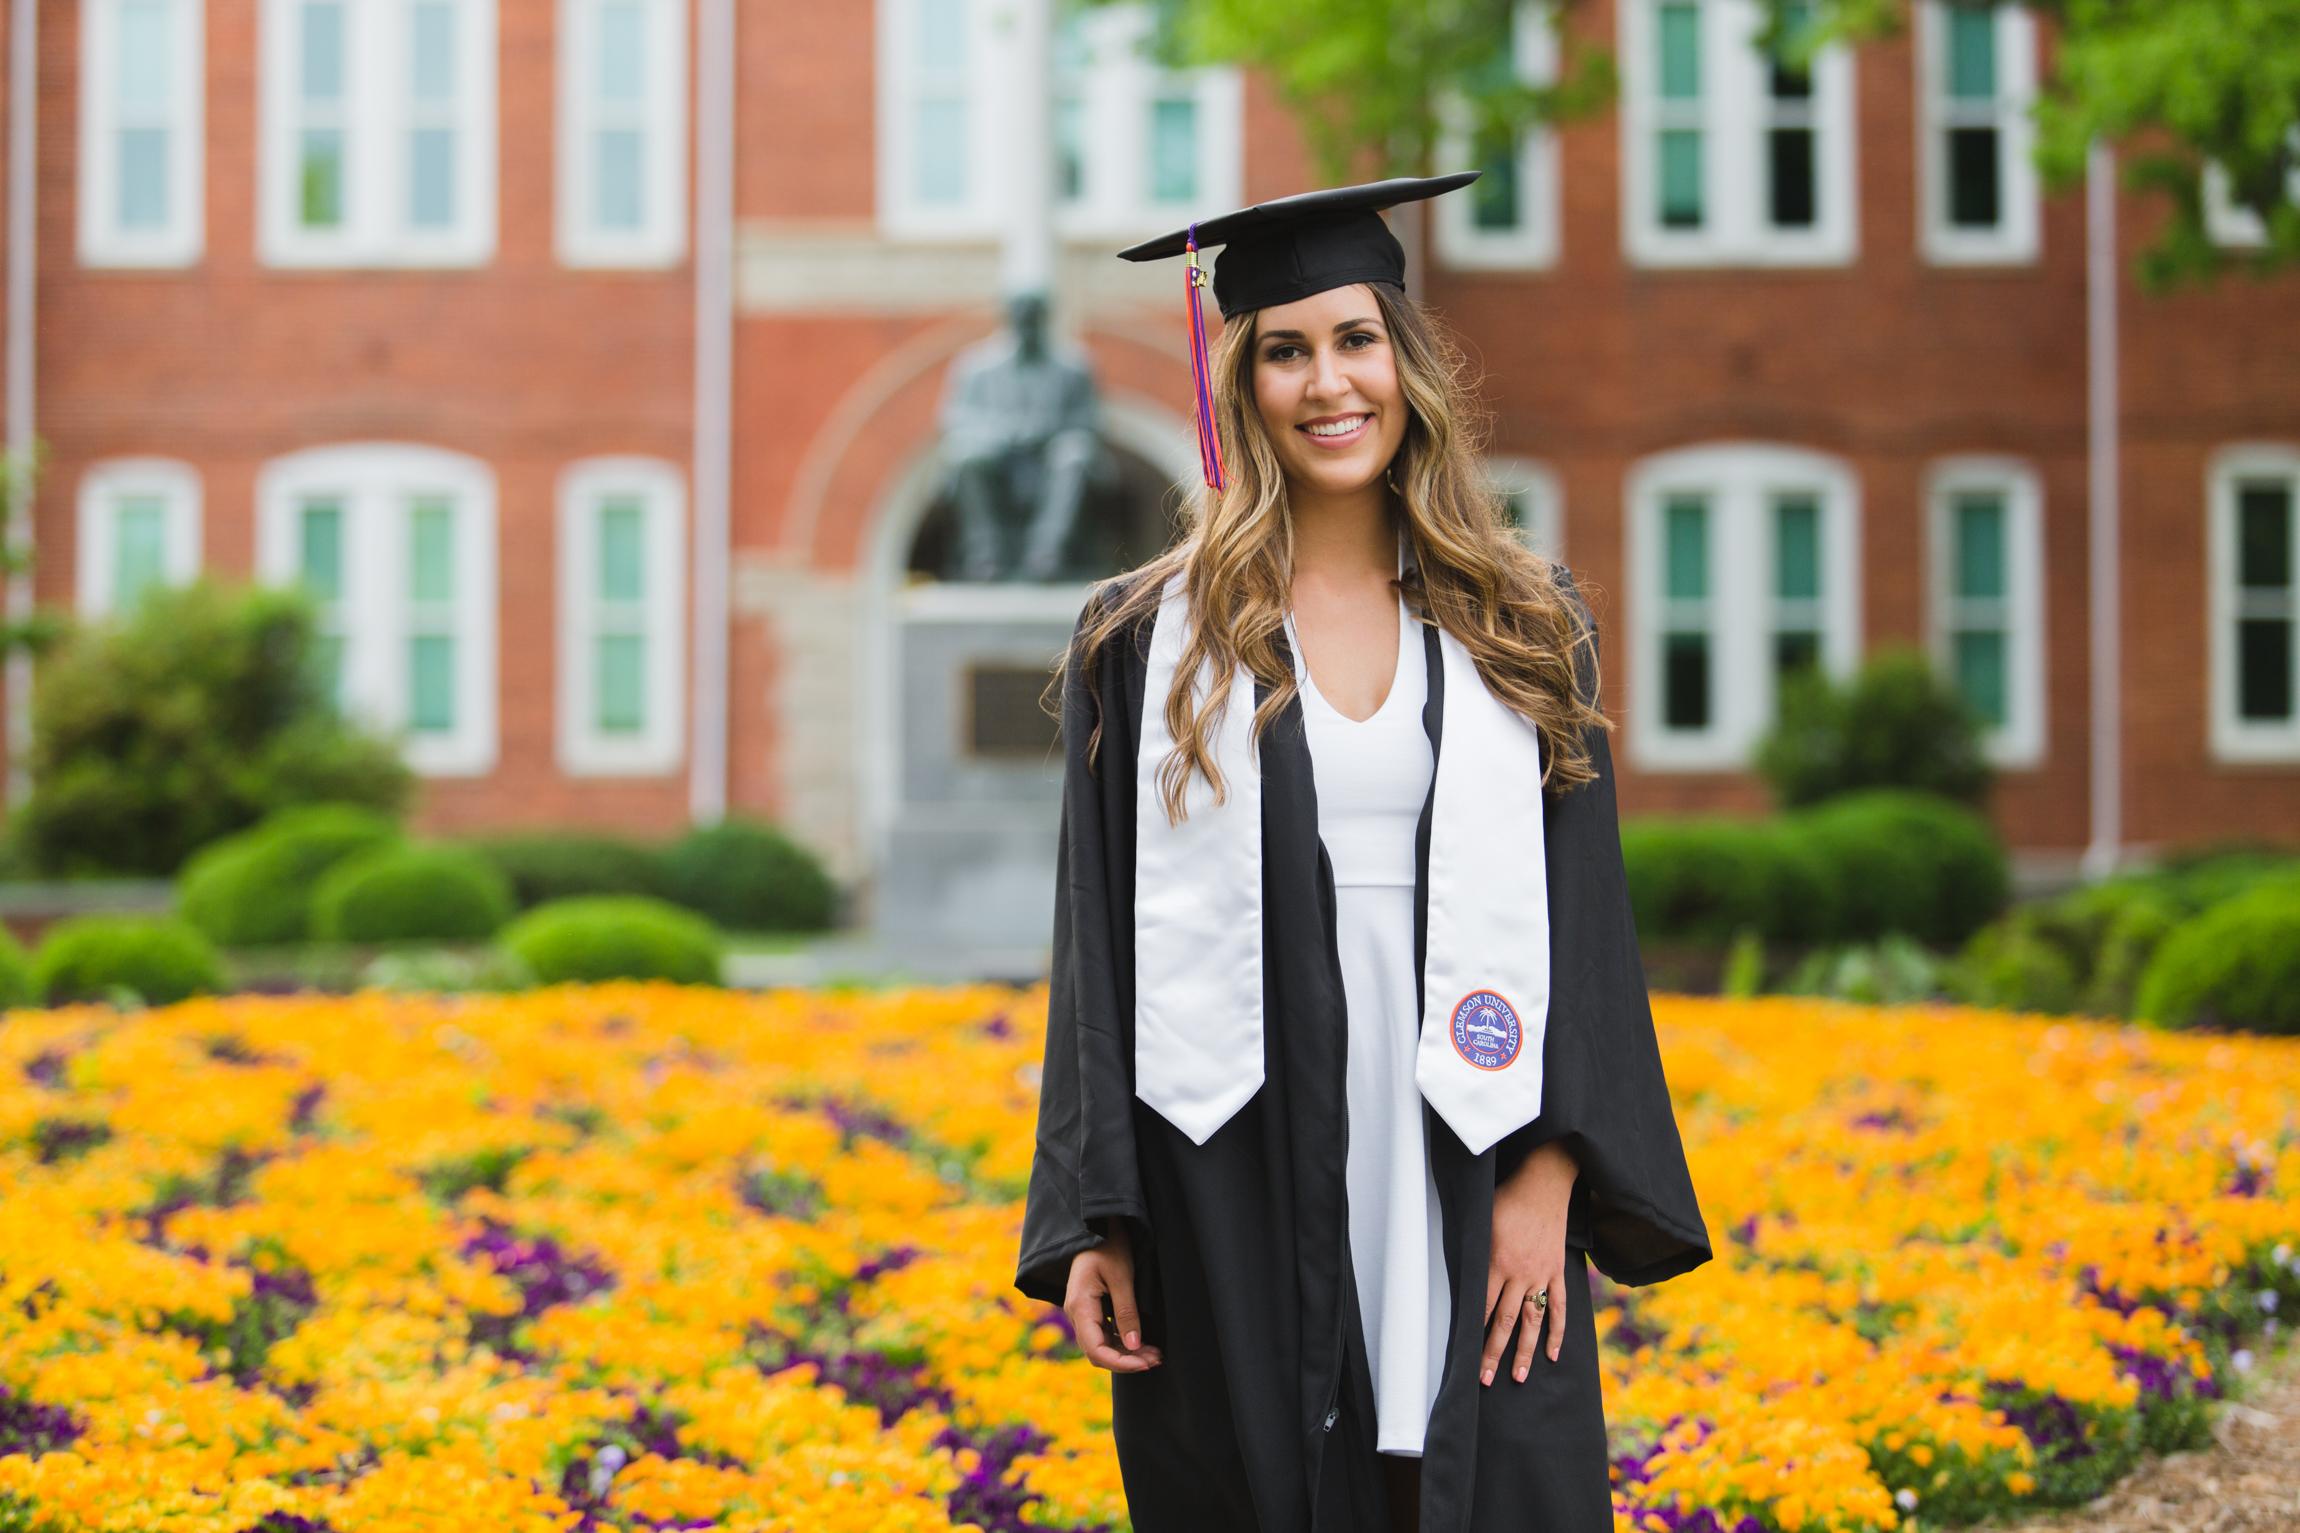 Abby Riggs-Clemson University Senior Photos_2017-0746.jpg